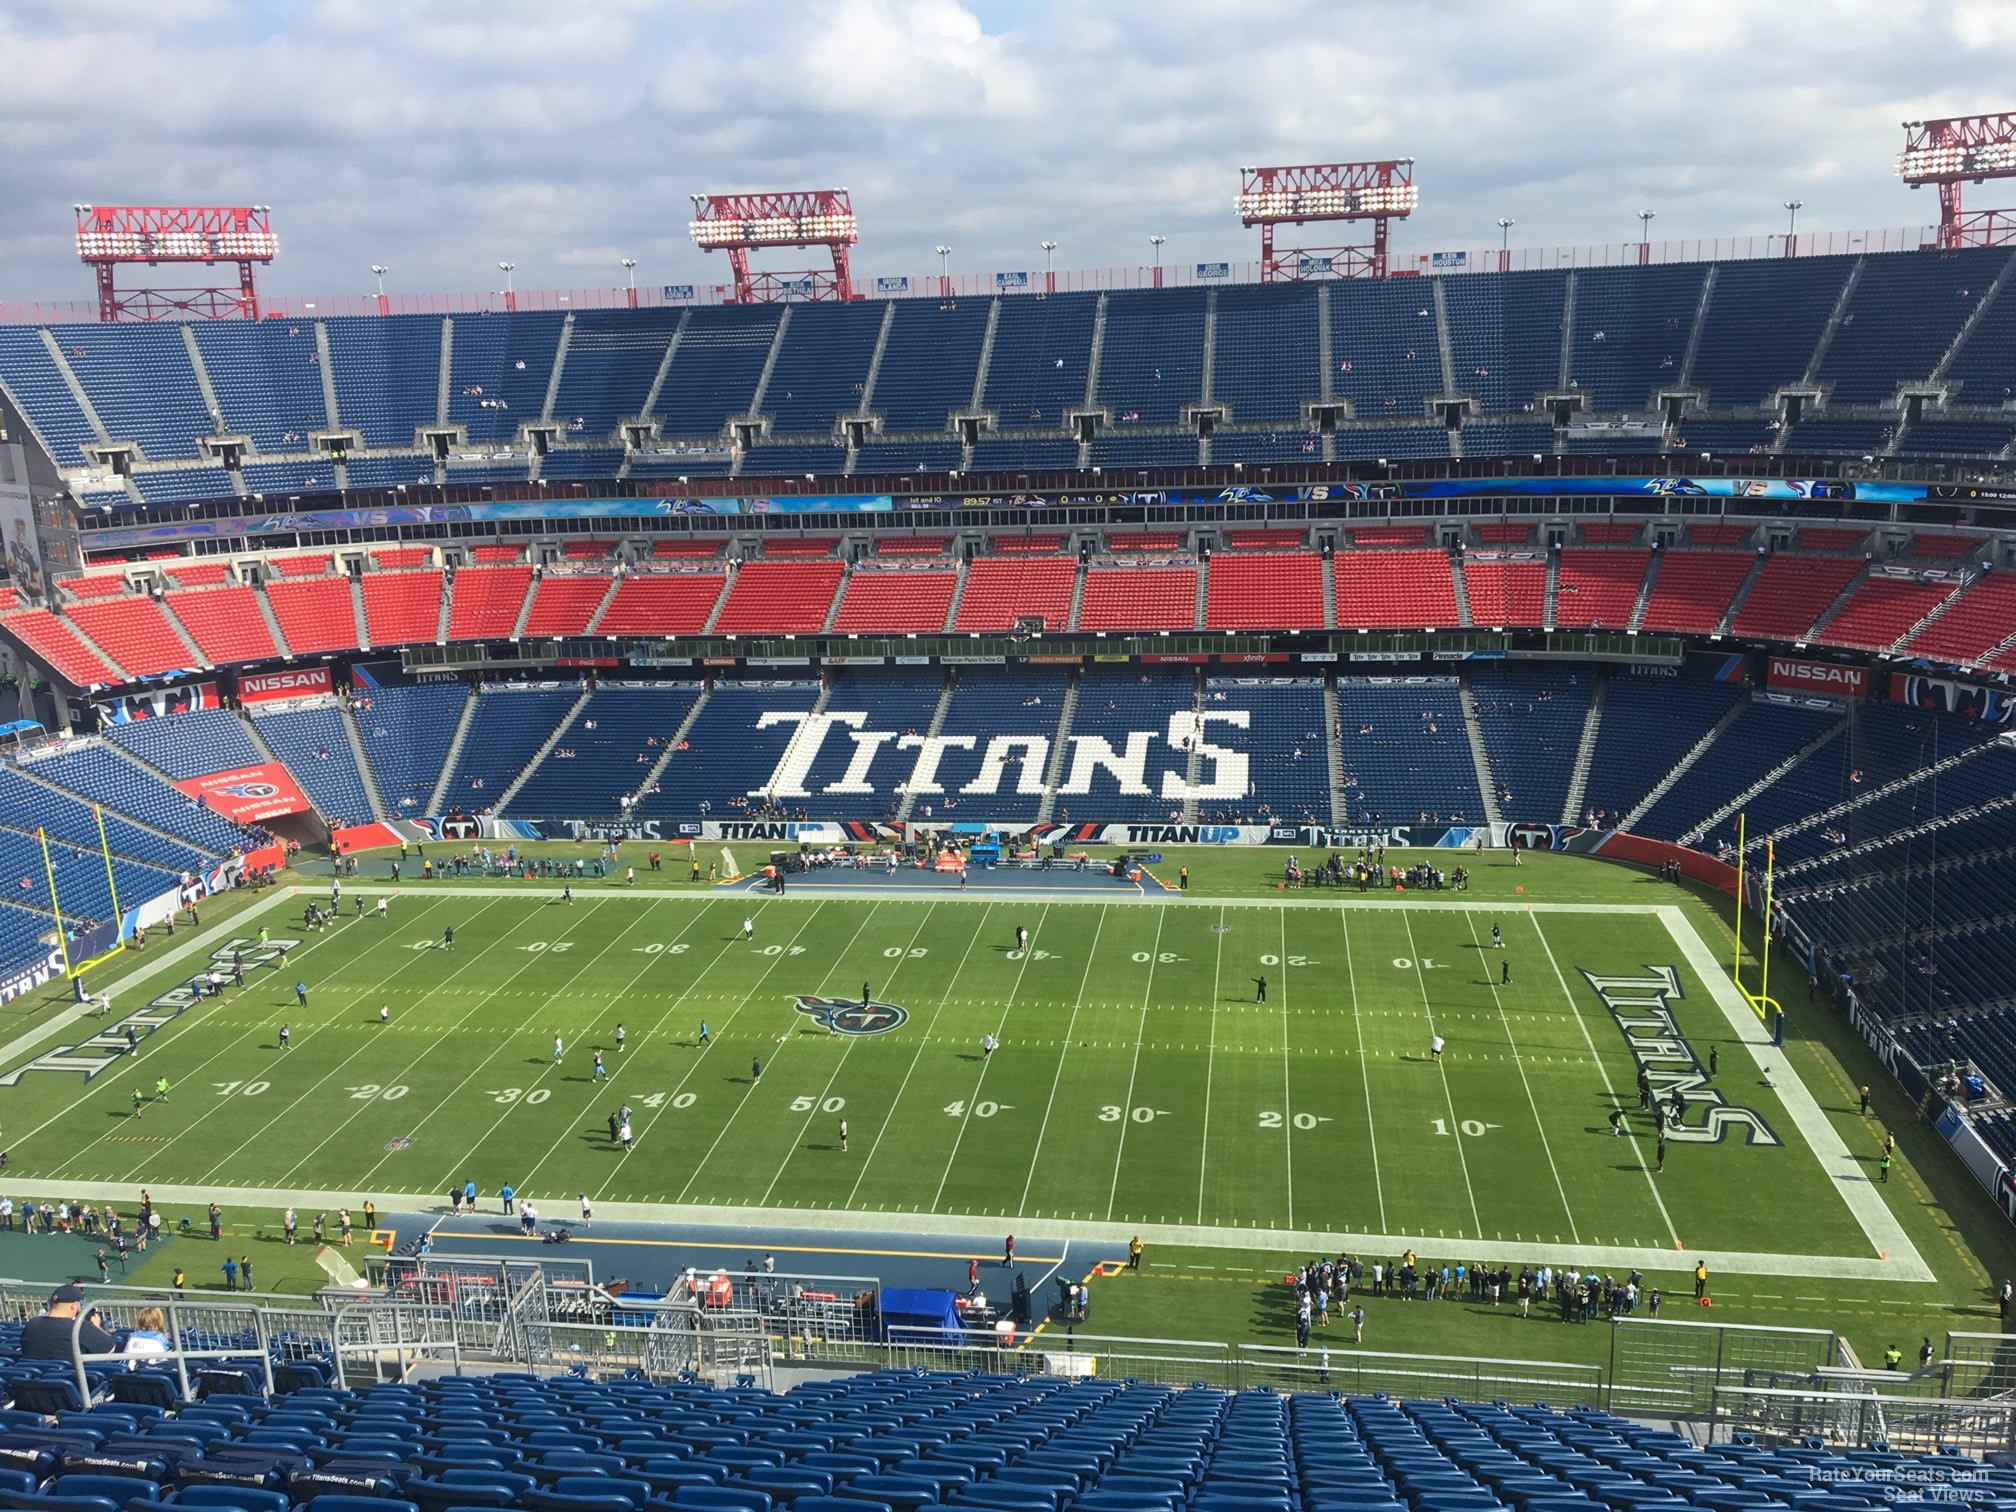 Nissan Stadium Section 333 Tennessee Titans